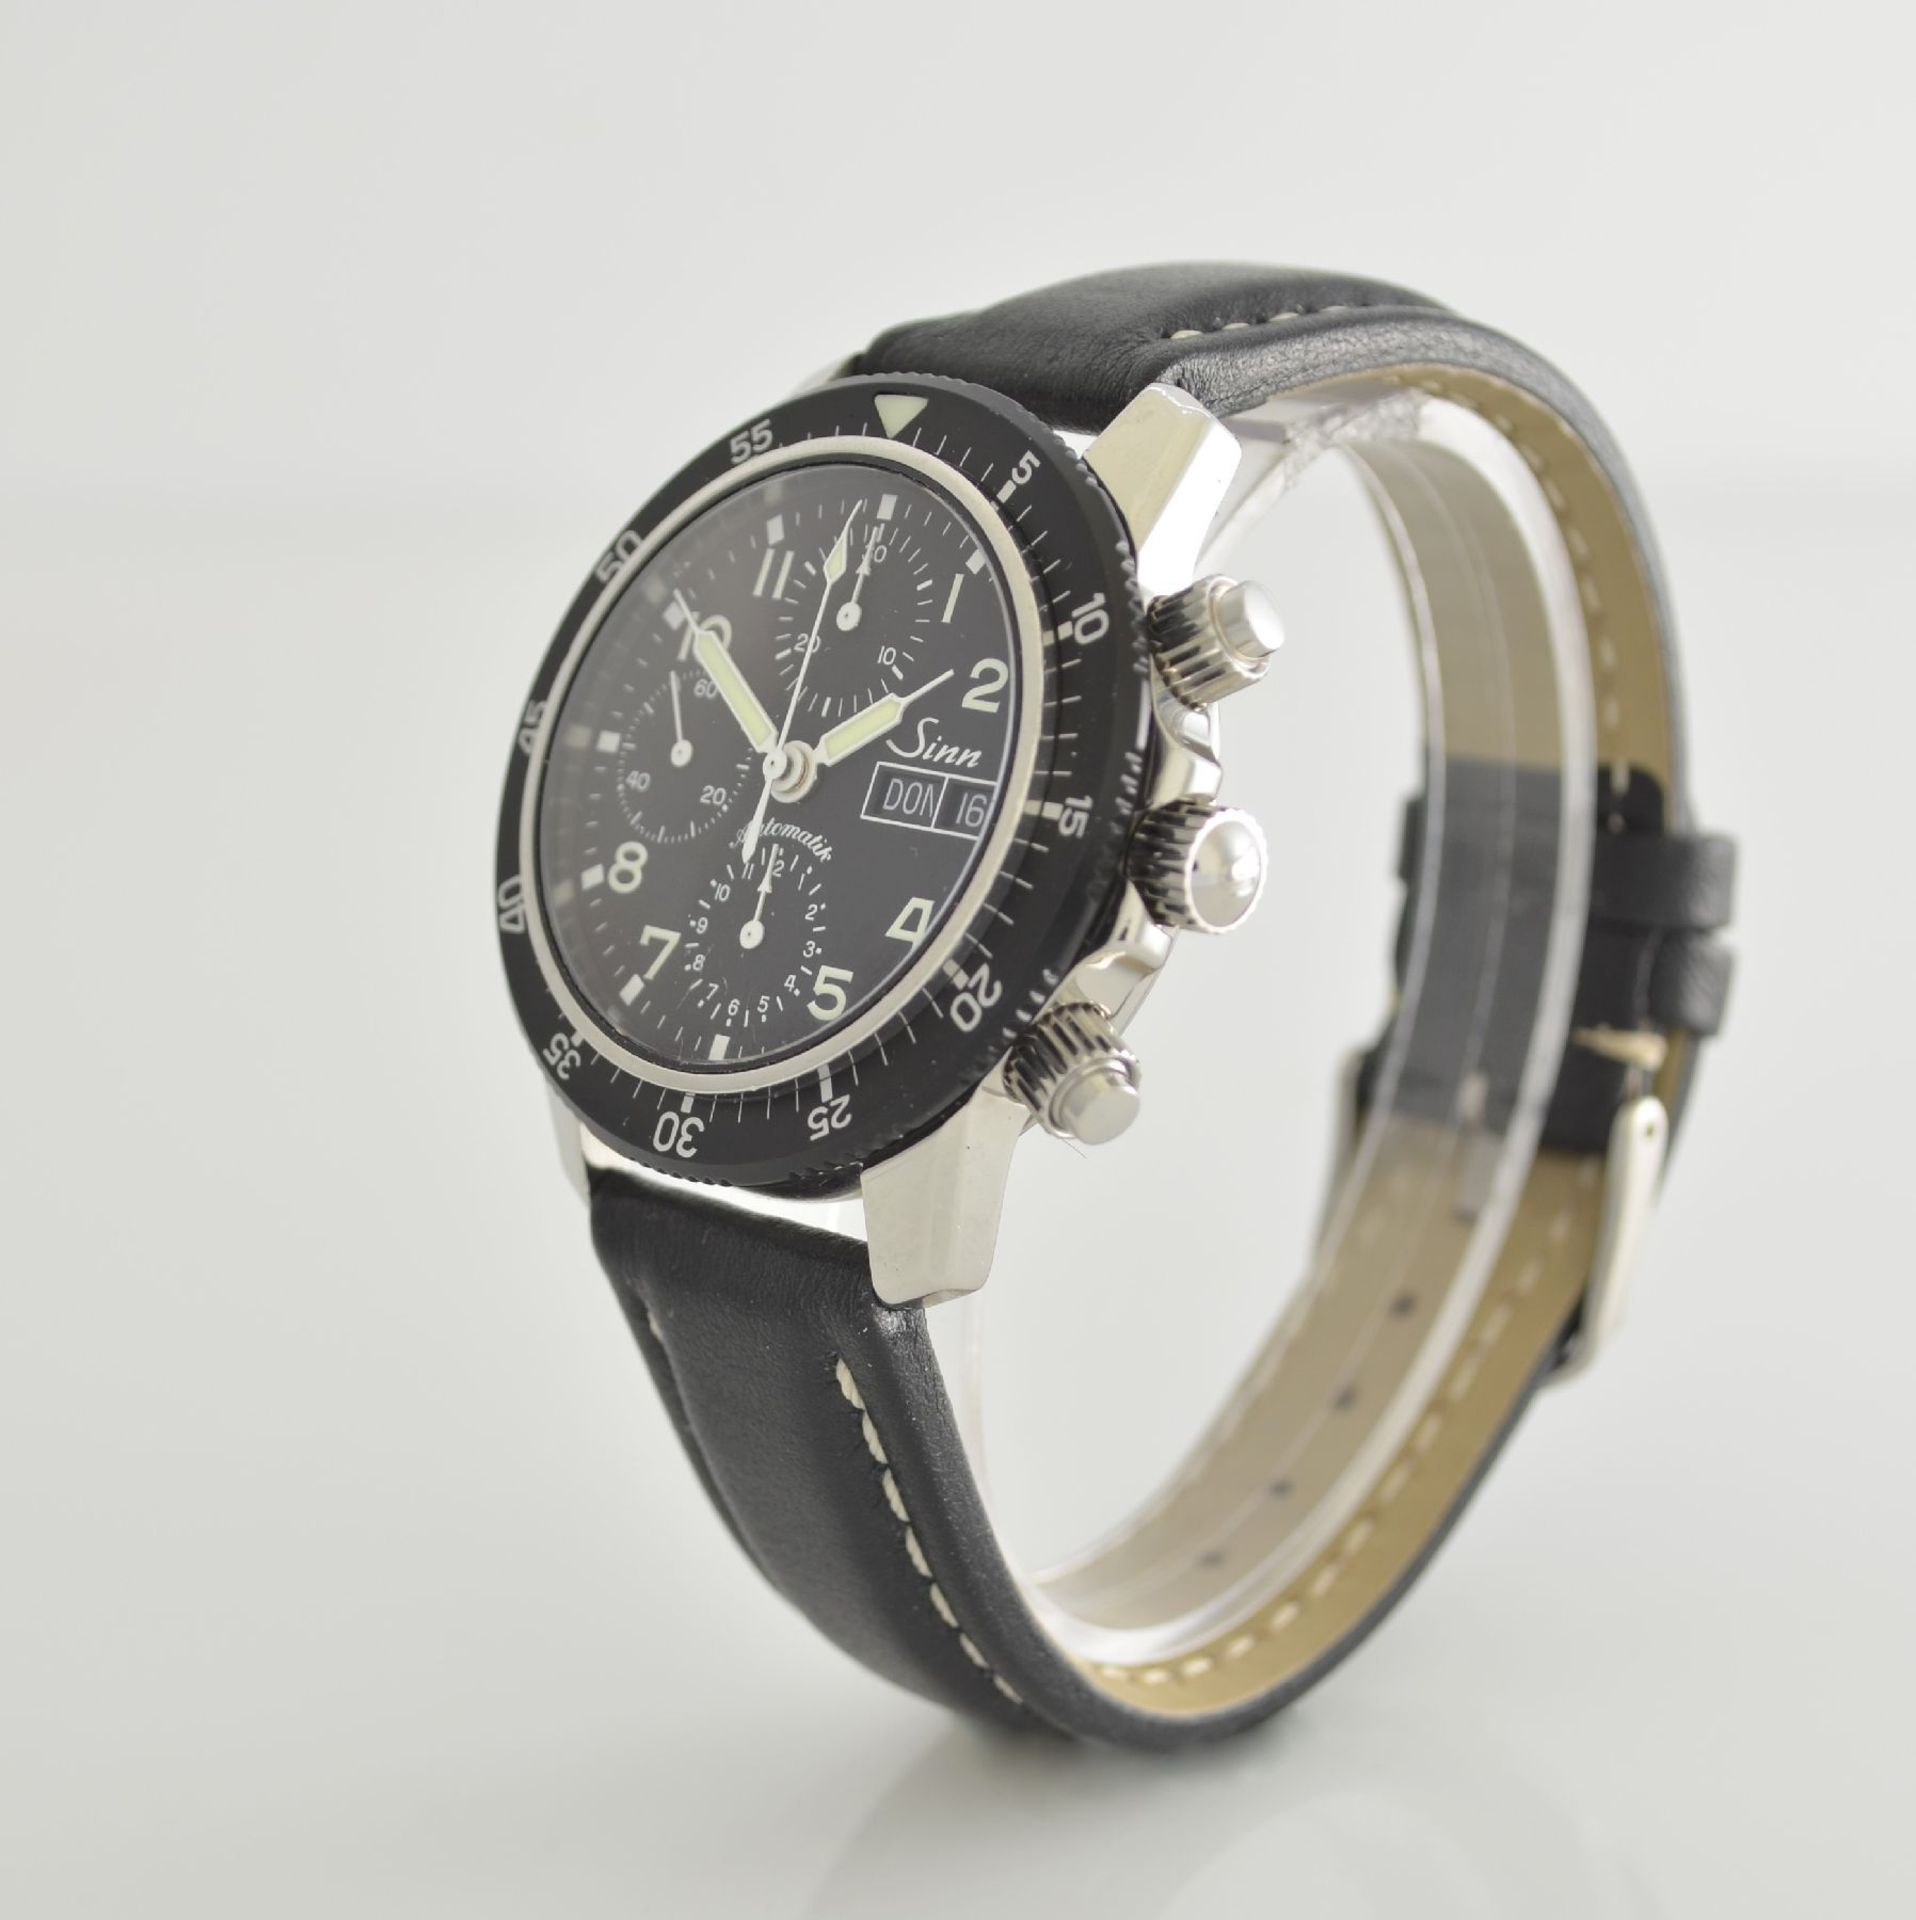 SINN Armbandchronograph, Automatik, Schweiz um 2010, pol. Edelstahlgeh. inkl. orig. Lederband m. - Bild 3 aus 6